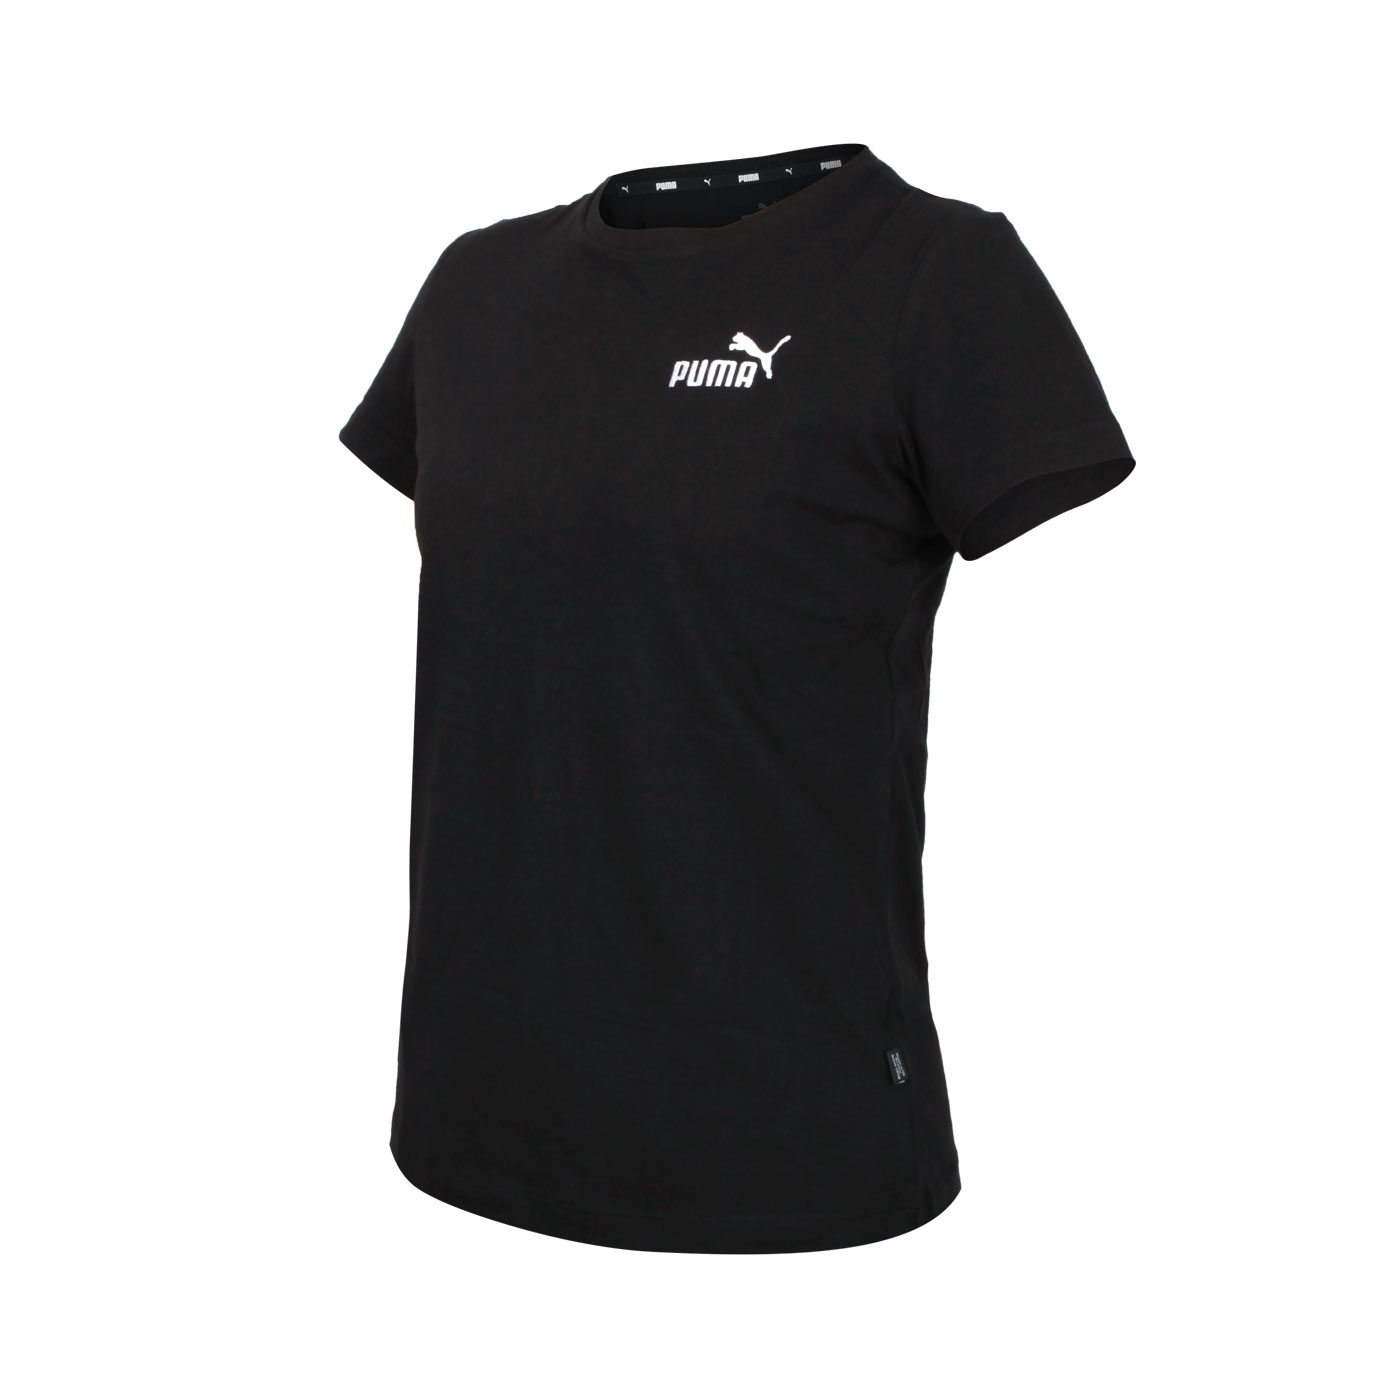 PUMA 女款基本系列Ess刺繡短袖T恤 58790151 - 黑白